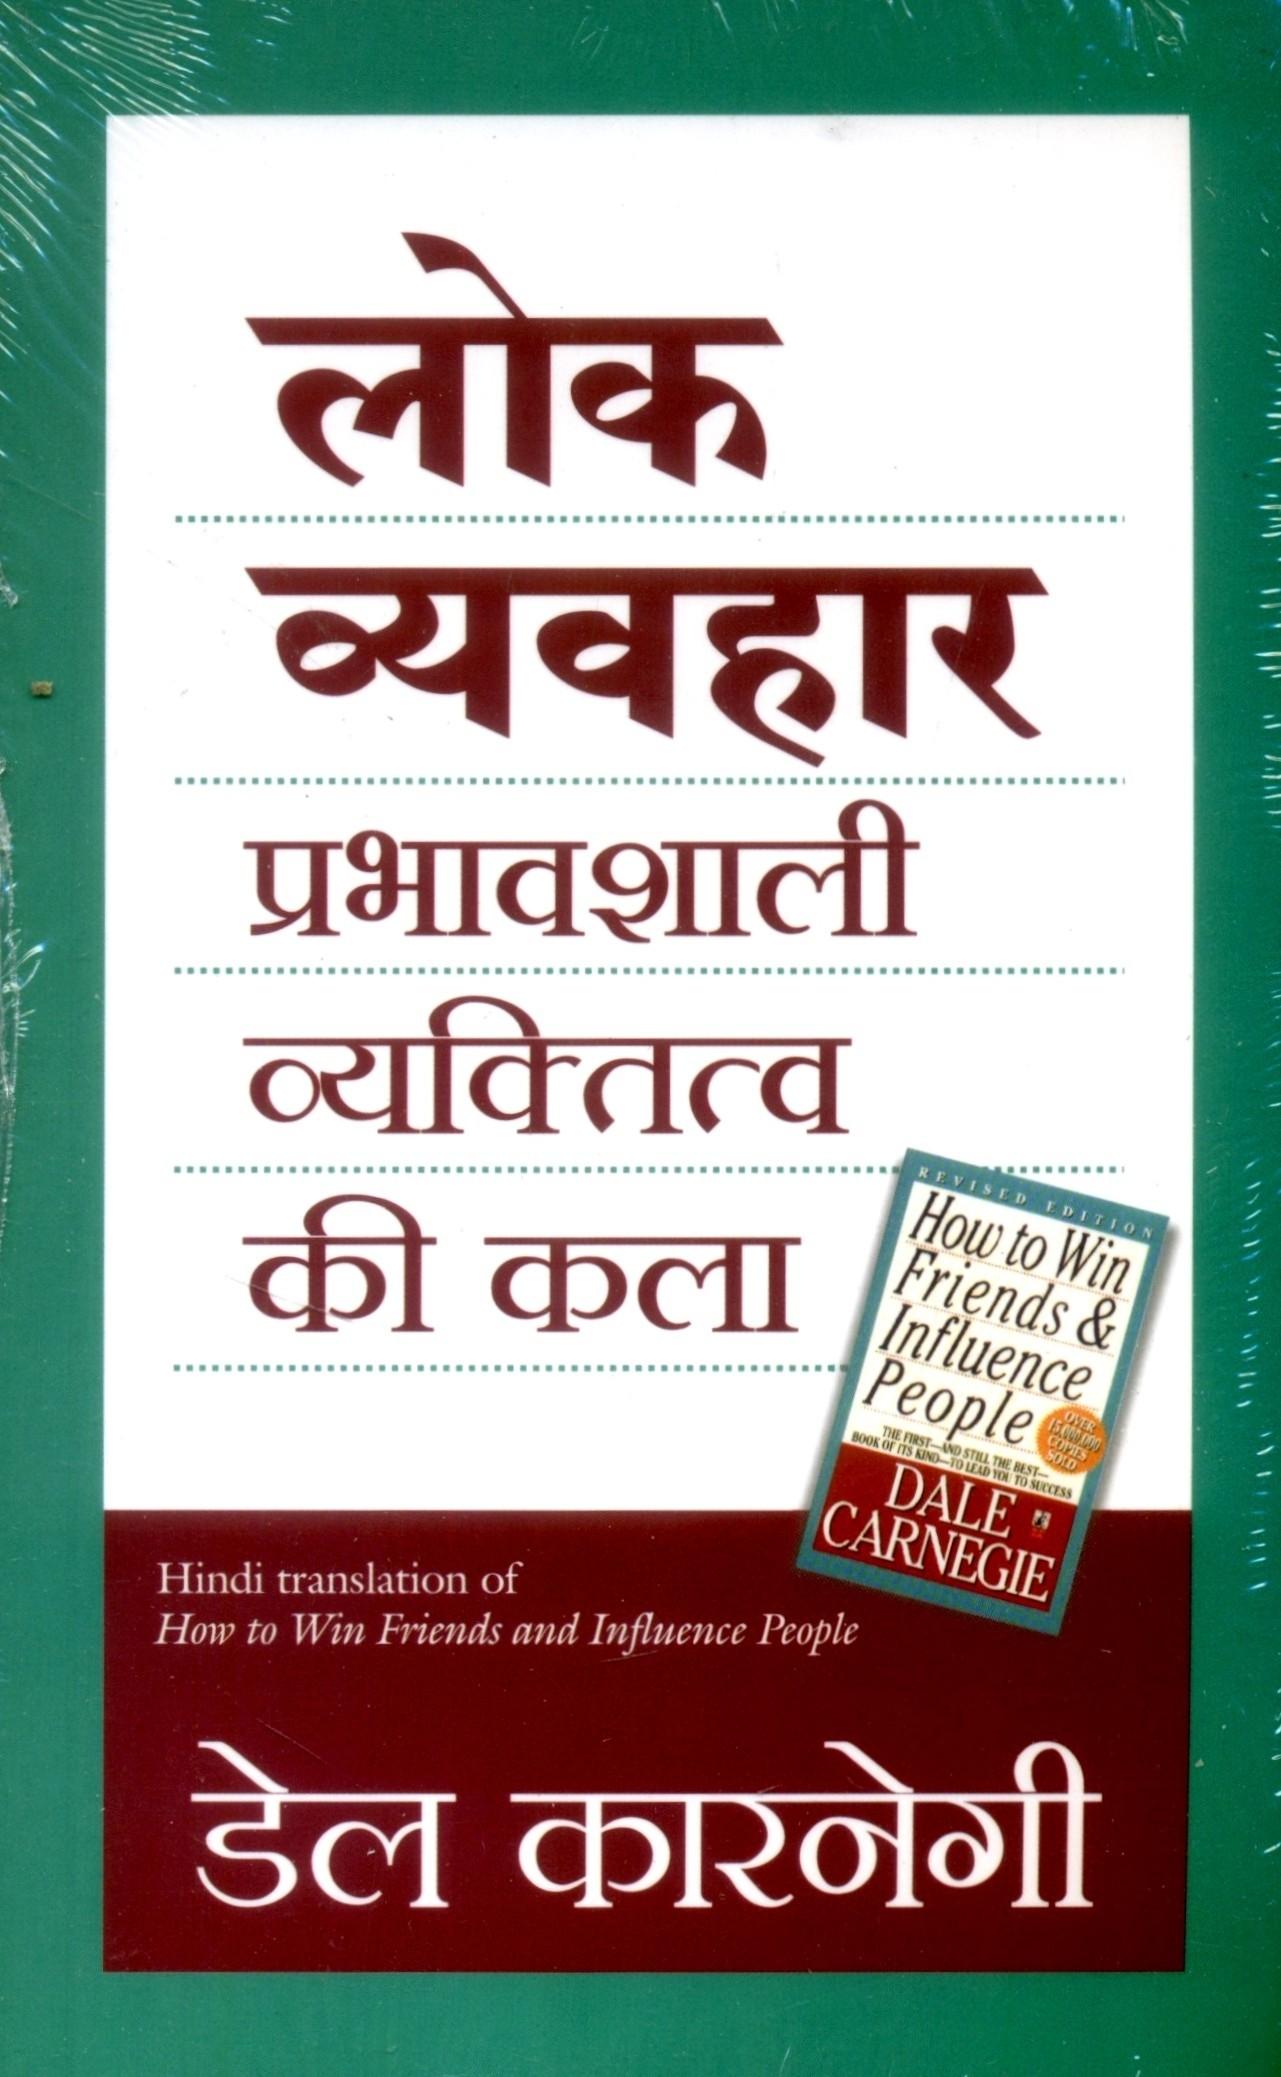 dale carnegie books pdf download